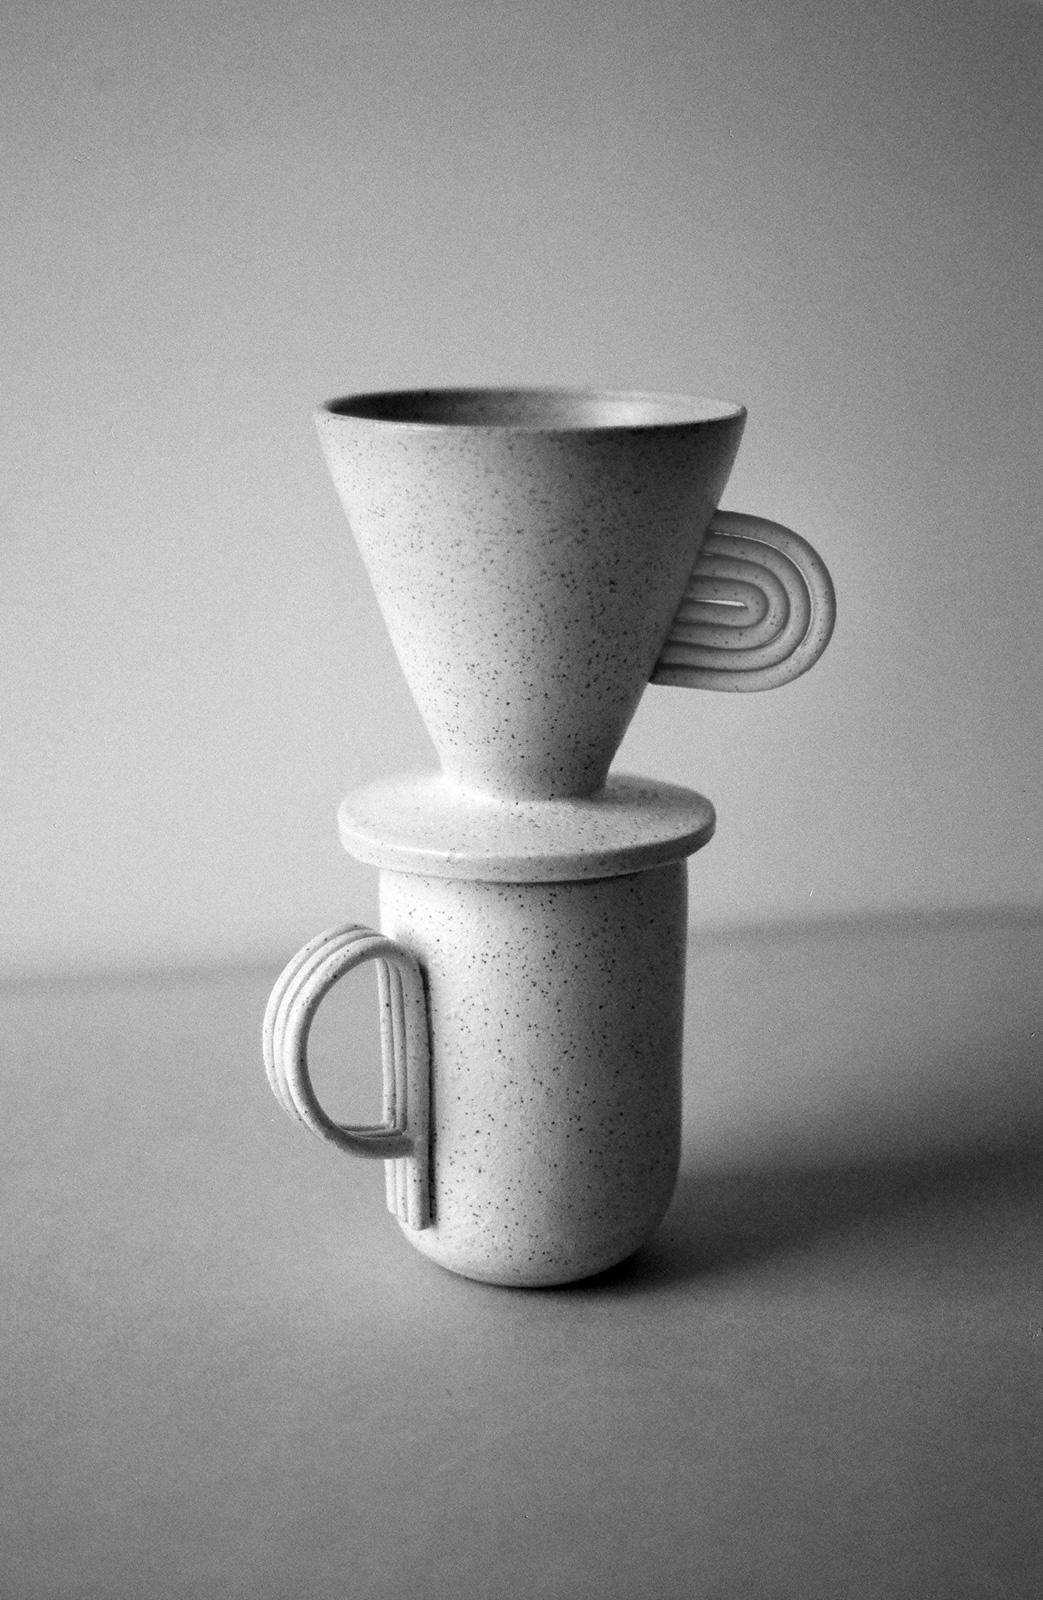 Design-Natalie-Weinberger-Ceramics-4